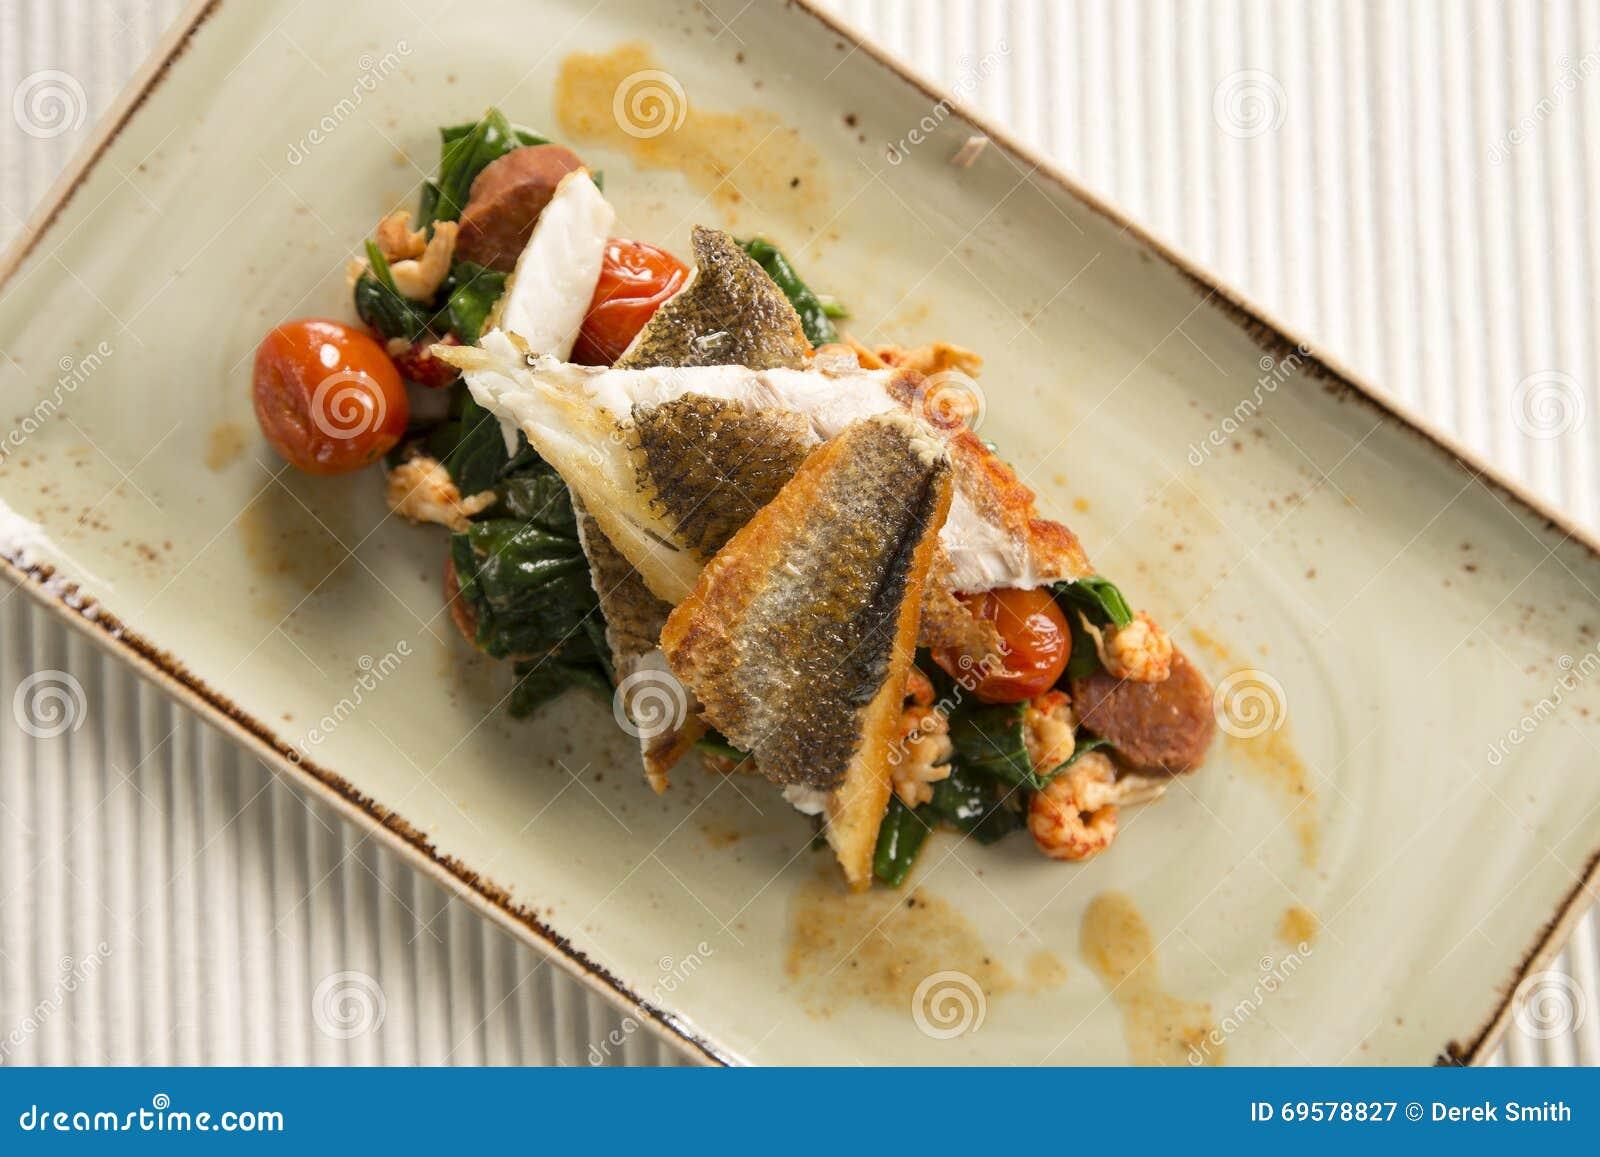 Pan fried sea bass with crayfish, chorizo, baby spinach & cherry tomatoes